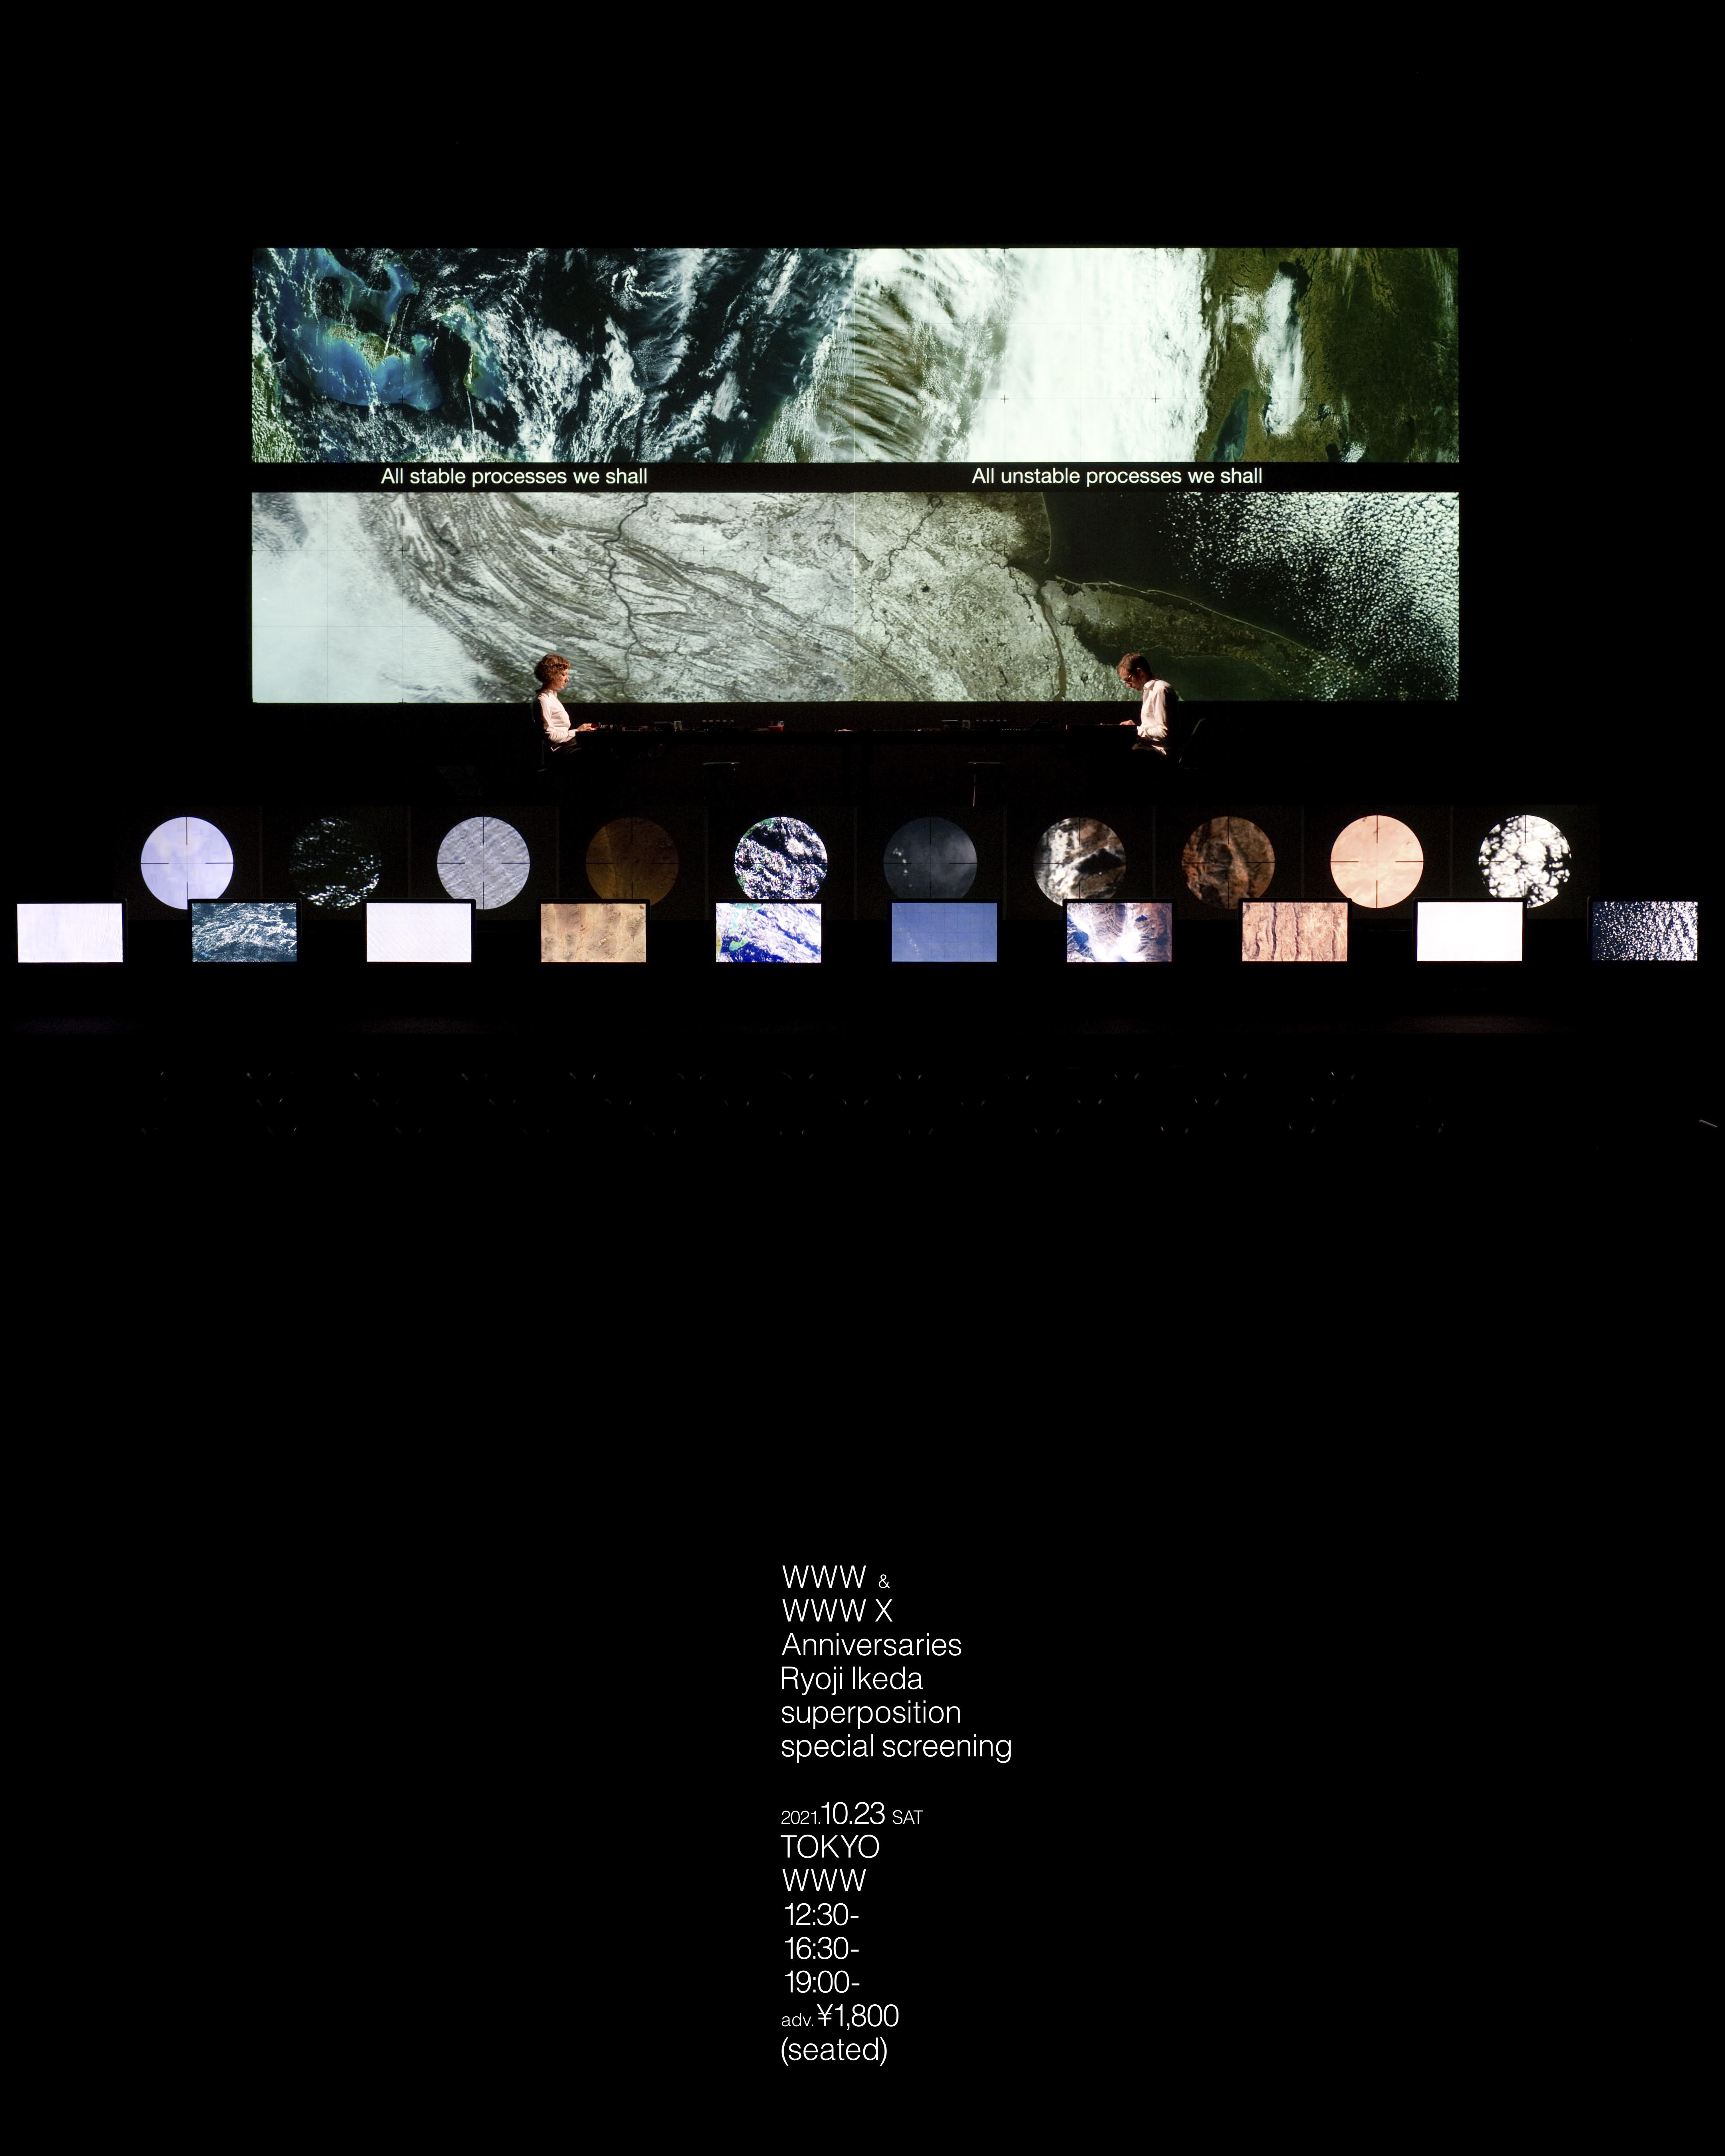 Ryoji Ikeda superposition special screening